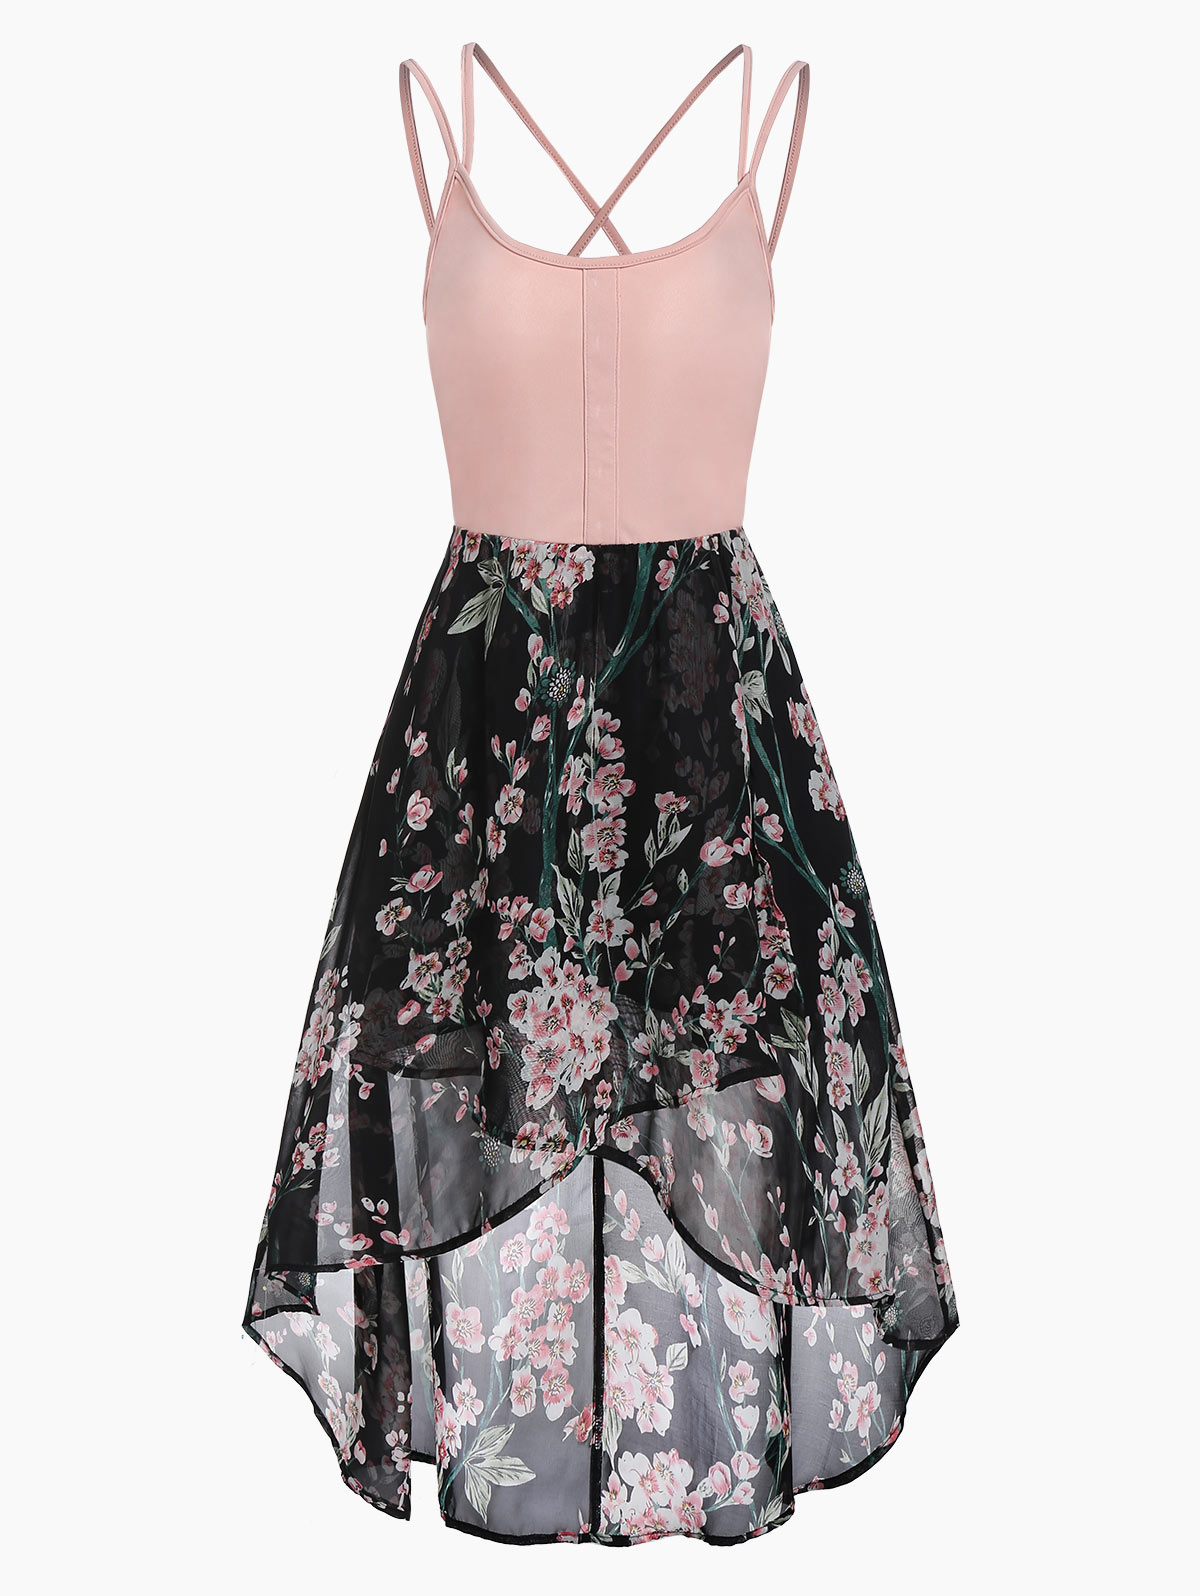 Wipalo Floral Print Cross Back Cami Dress Spaghetti Strap Asymmetric Dress High Waisted Mid-Calf Casual Chiffon Dress Vestidos